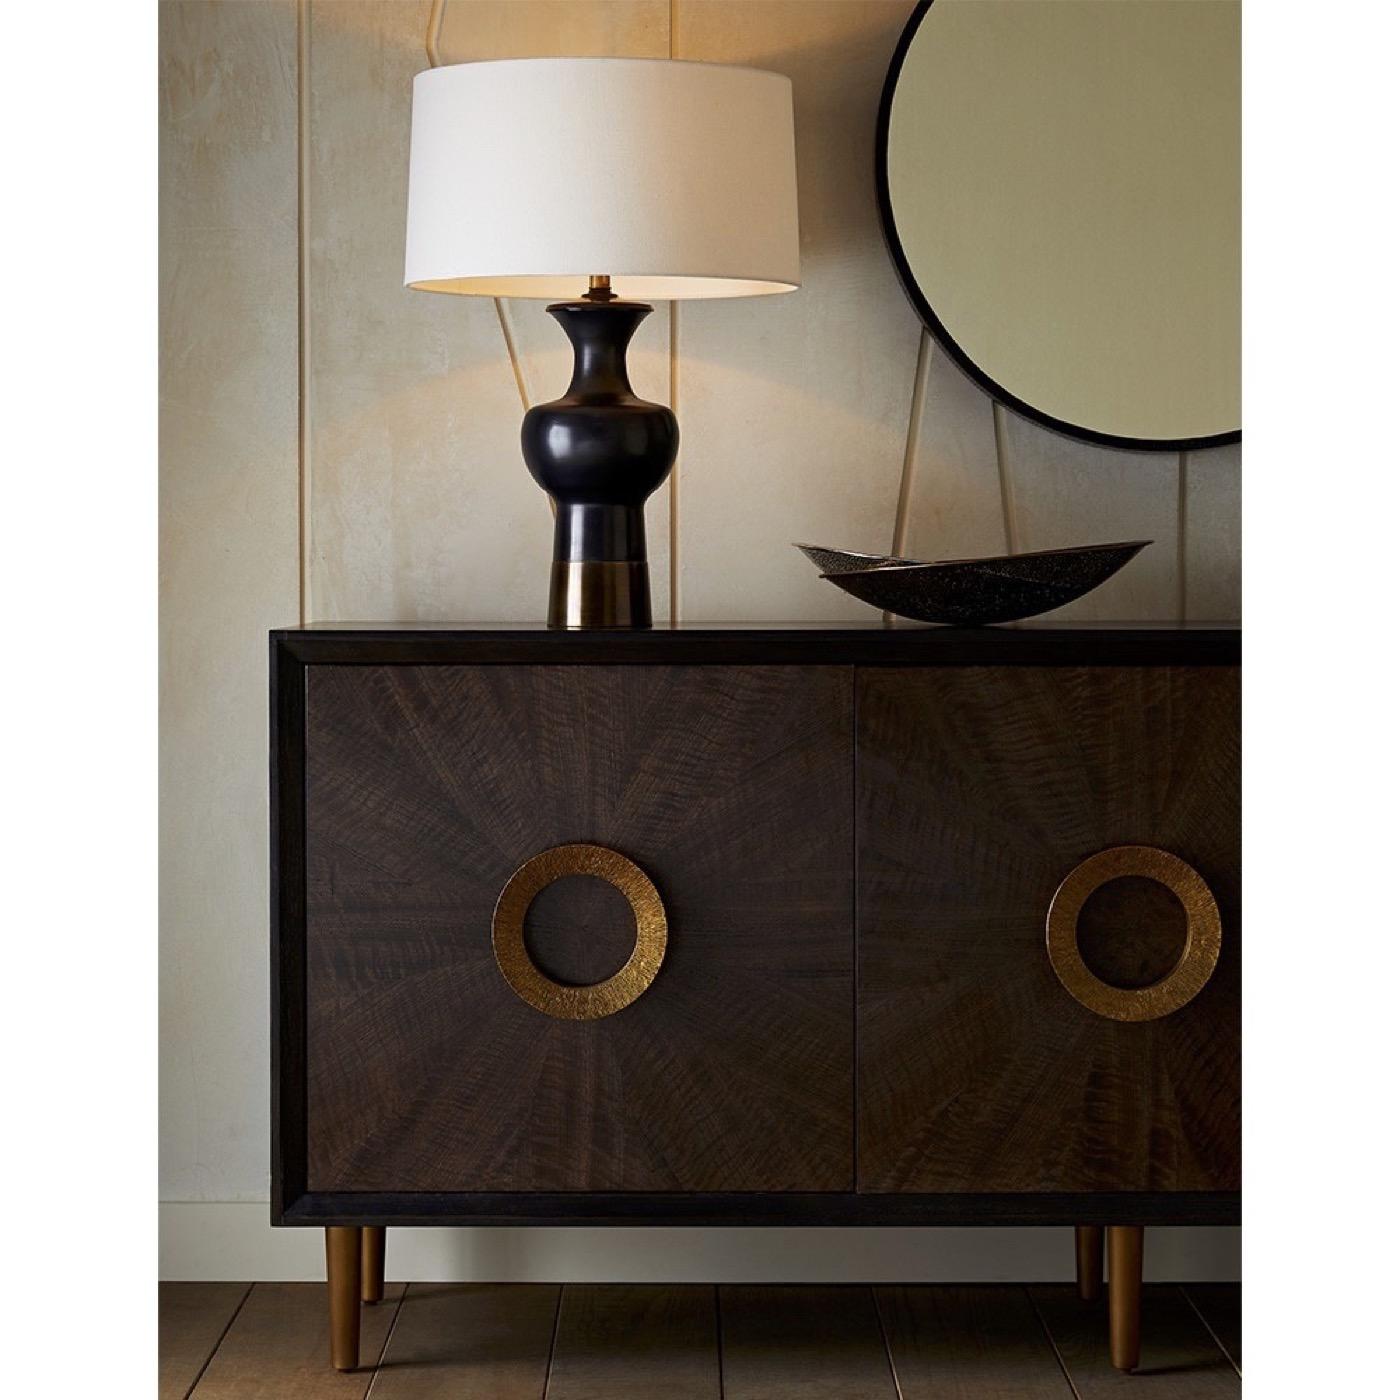 Tony Bronze & Brass Table Lamp